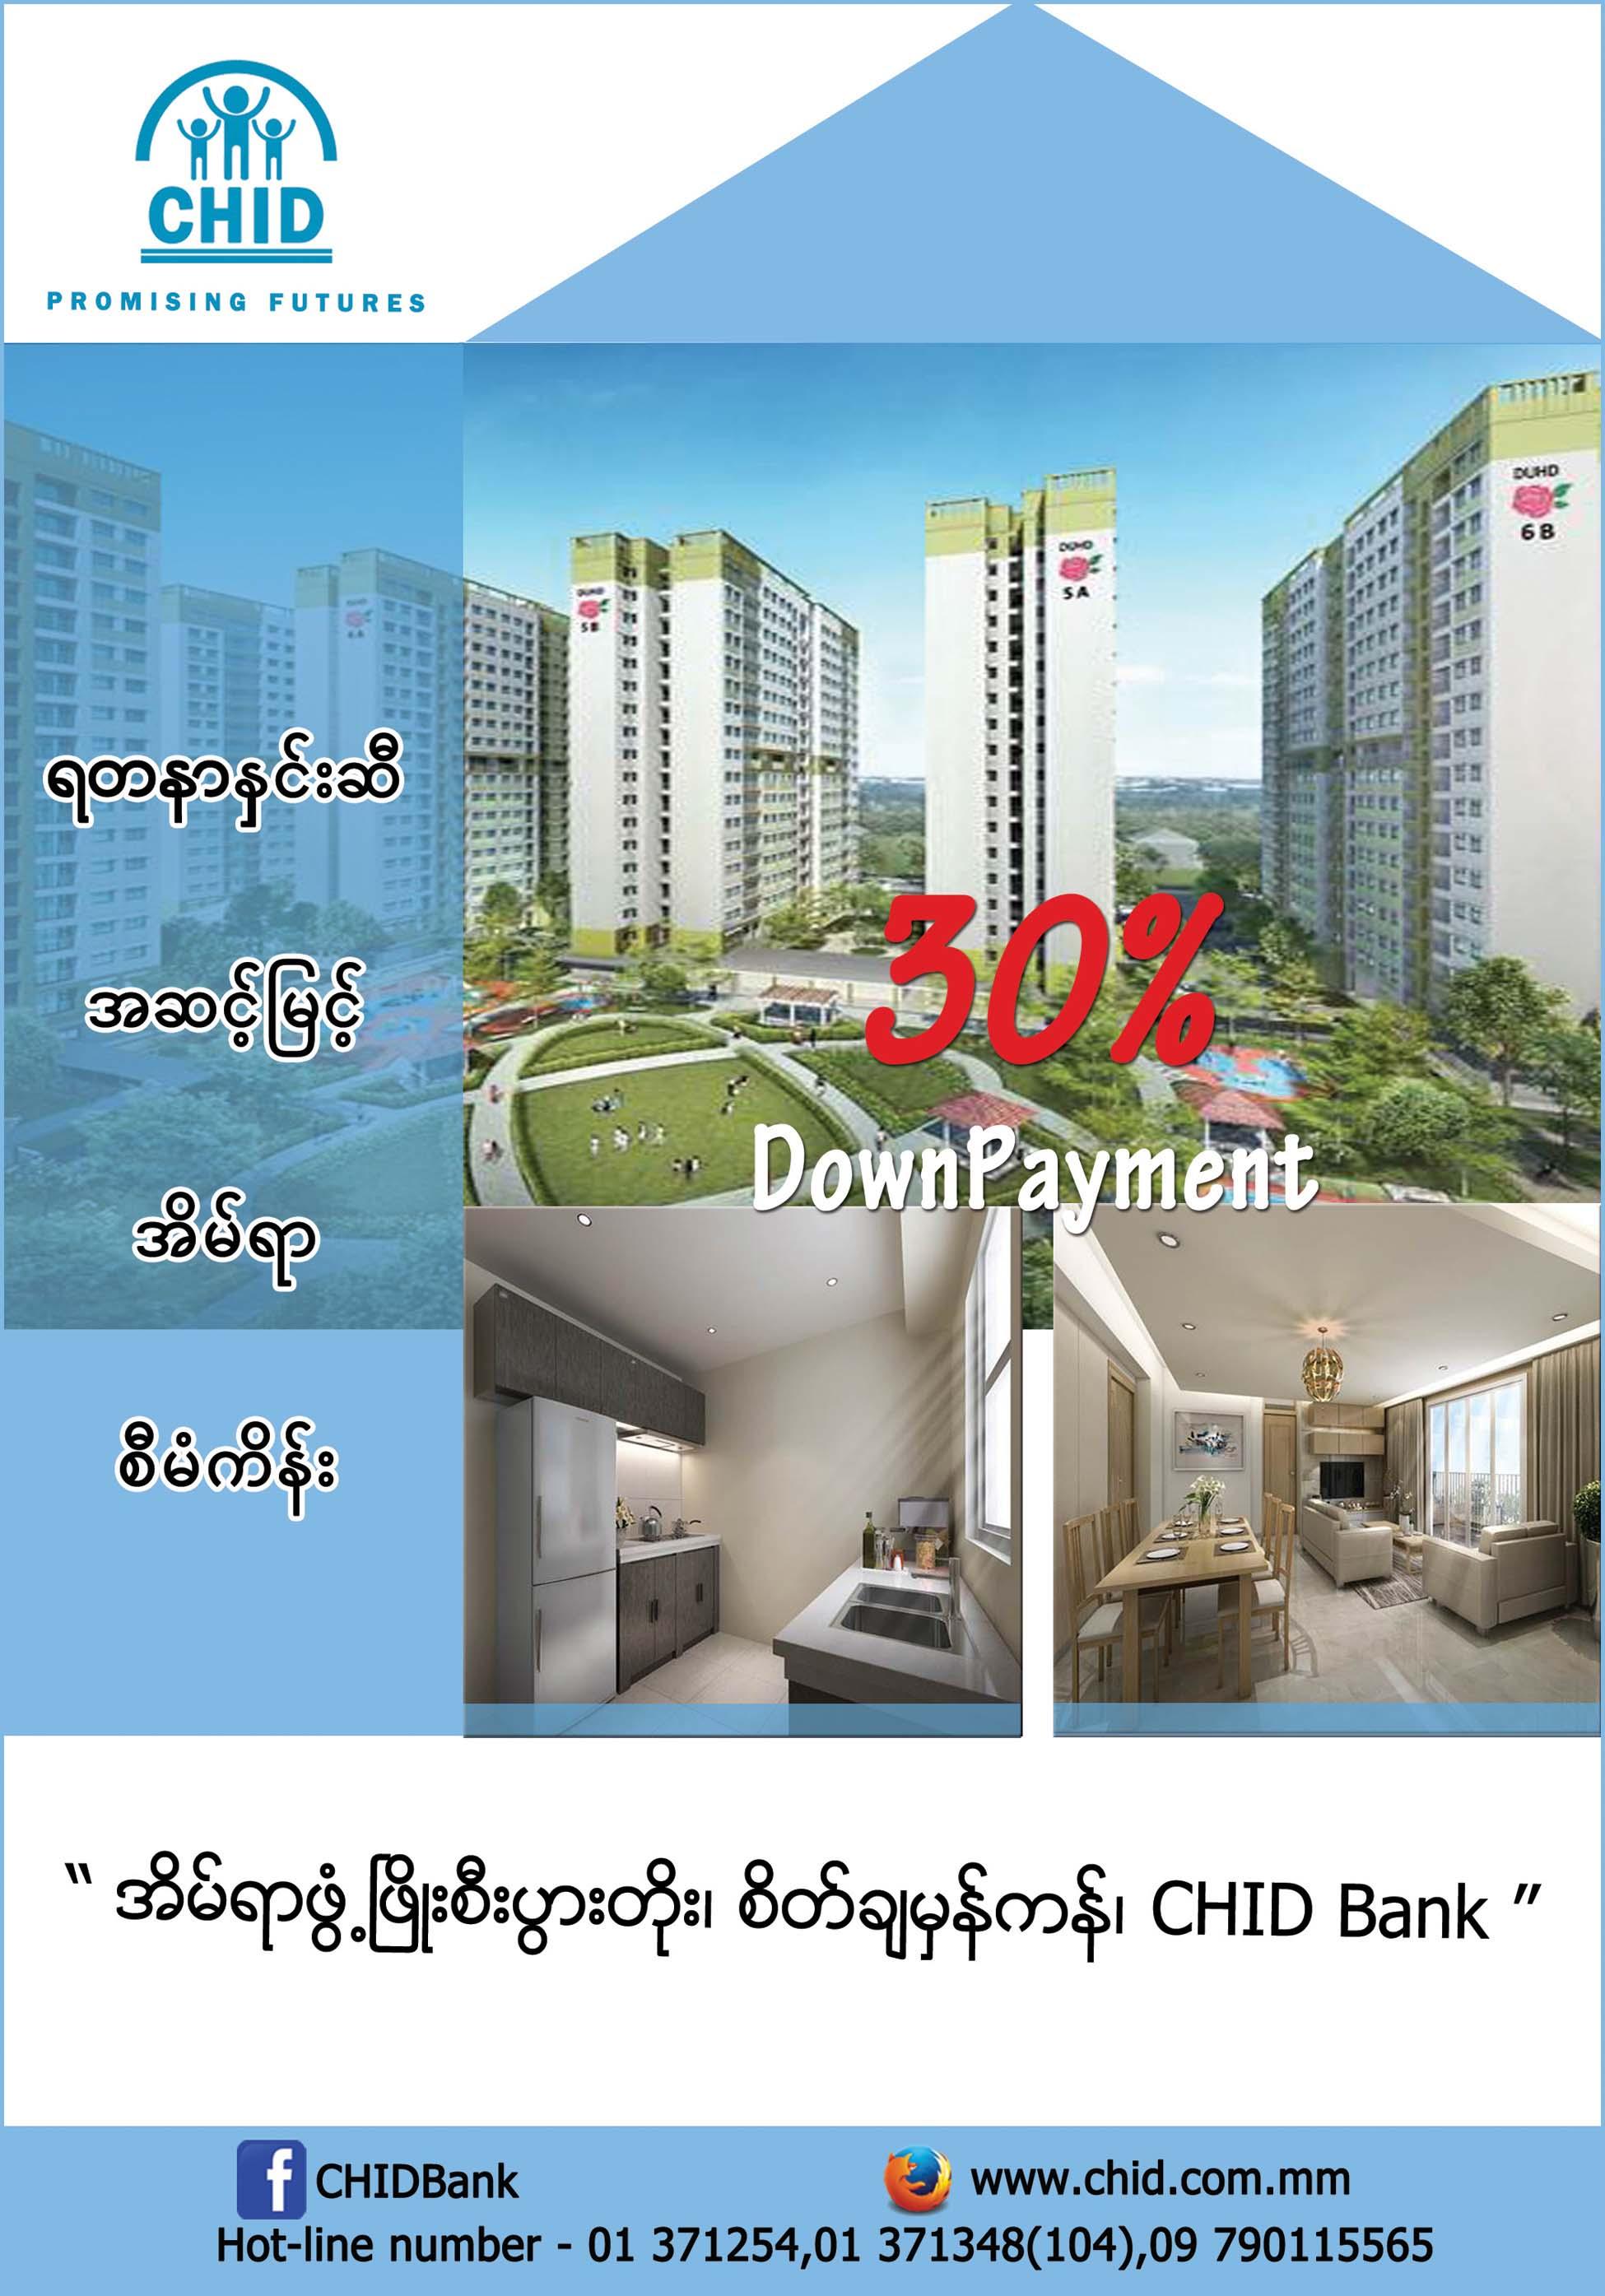 Construction, Housing and Infrastructure Development Bank